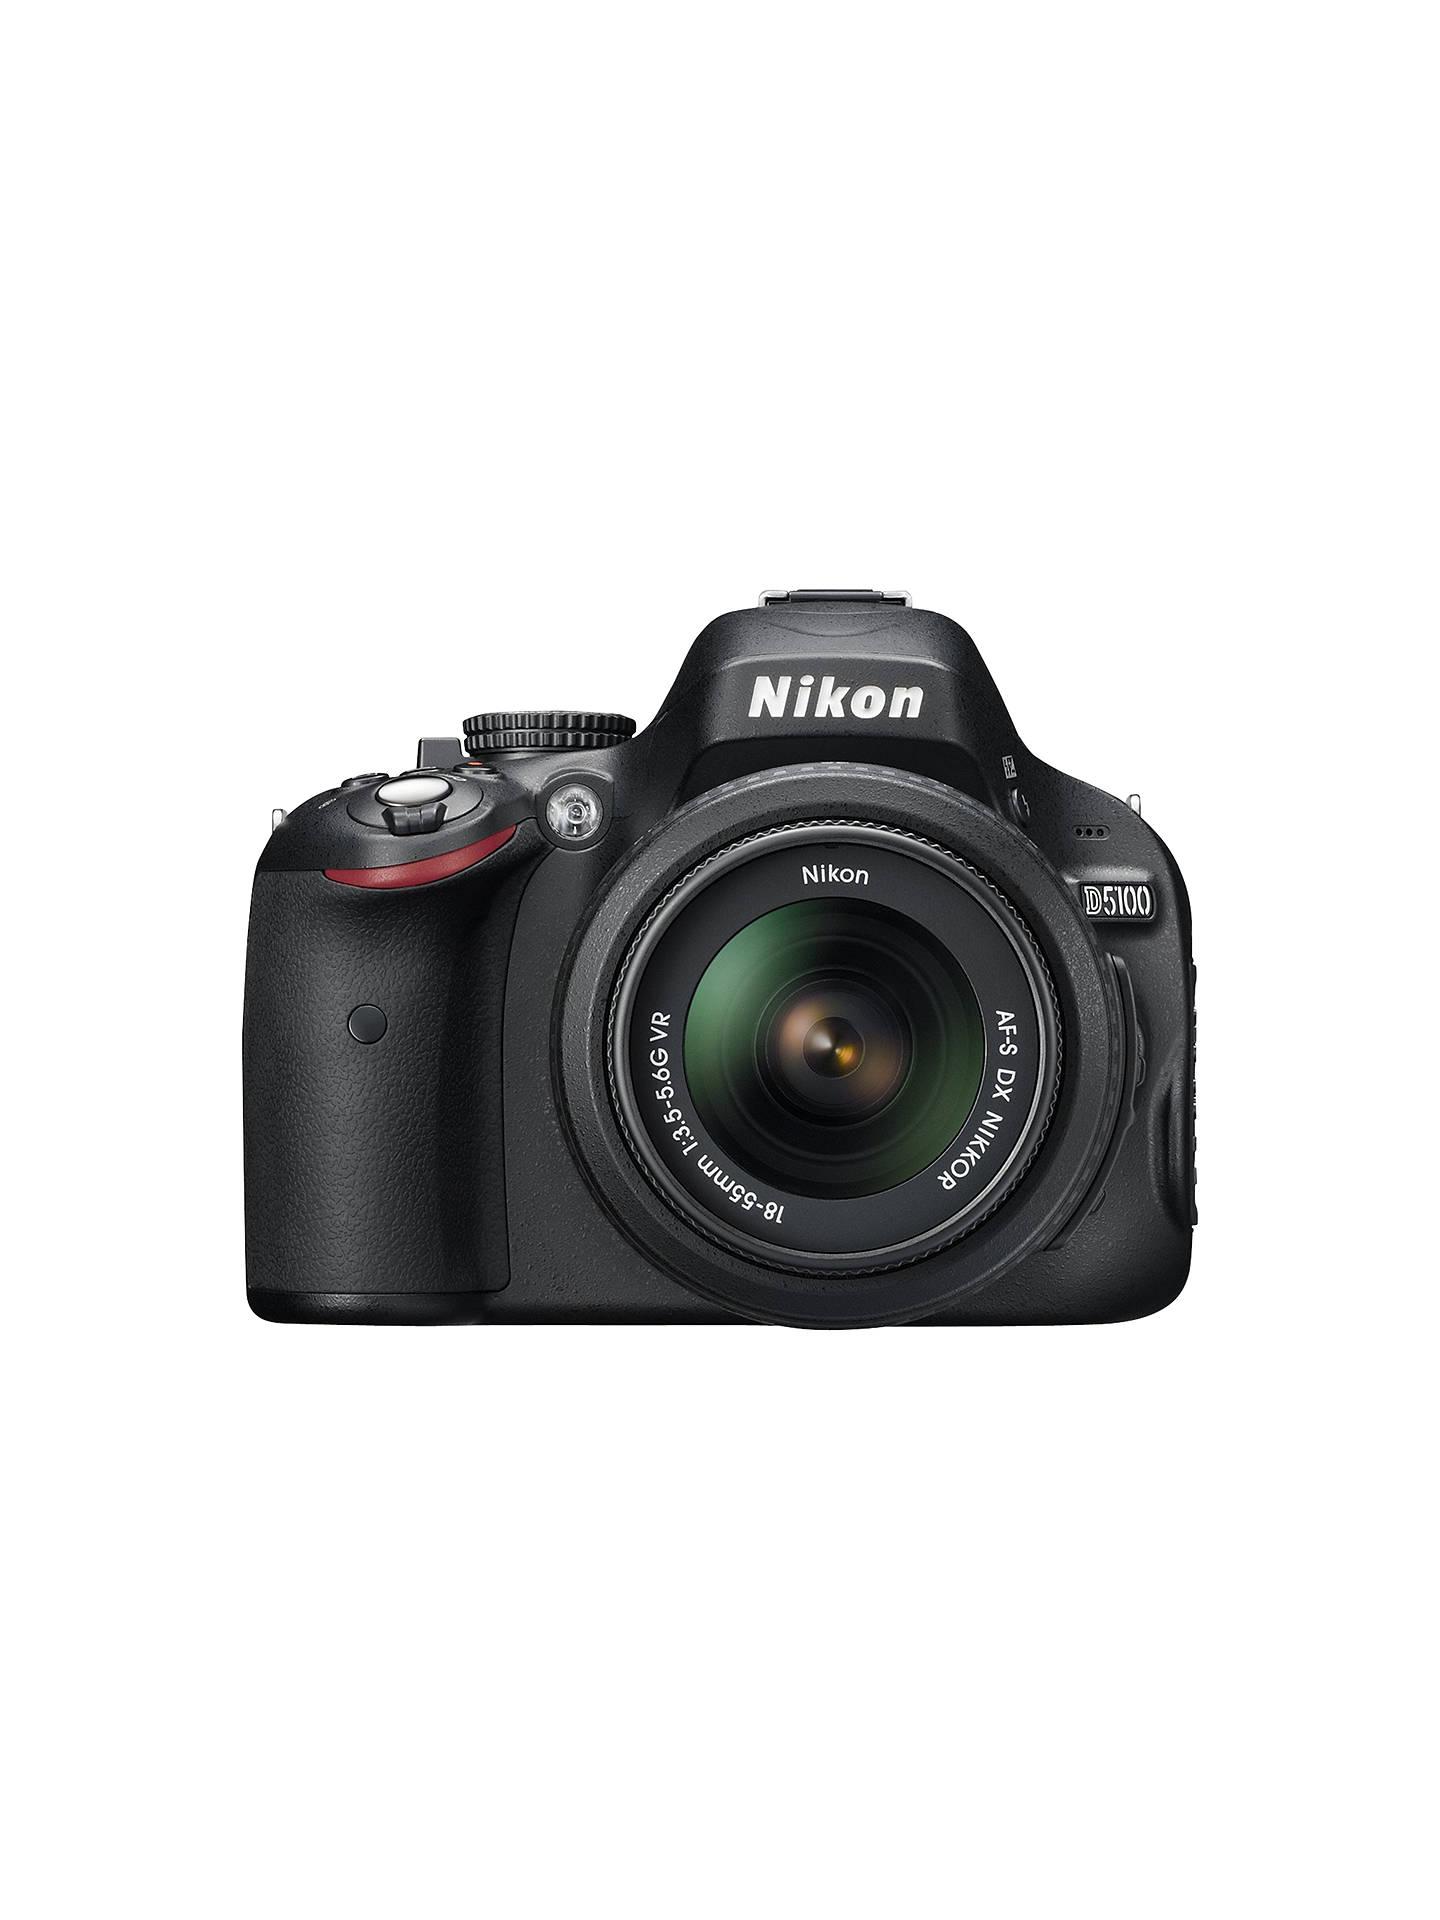 Buy Nikon D5100 Digital SLR Camera with 18-55mm & 55-200mm VR Lens ...